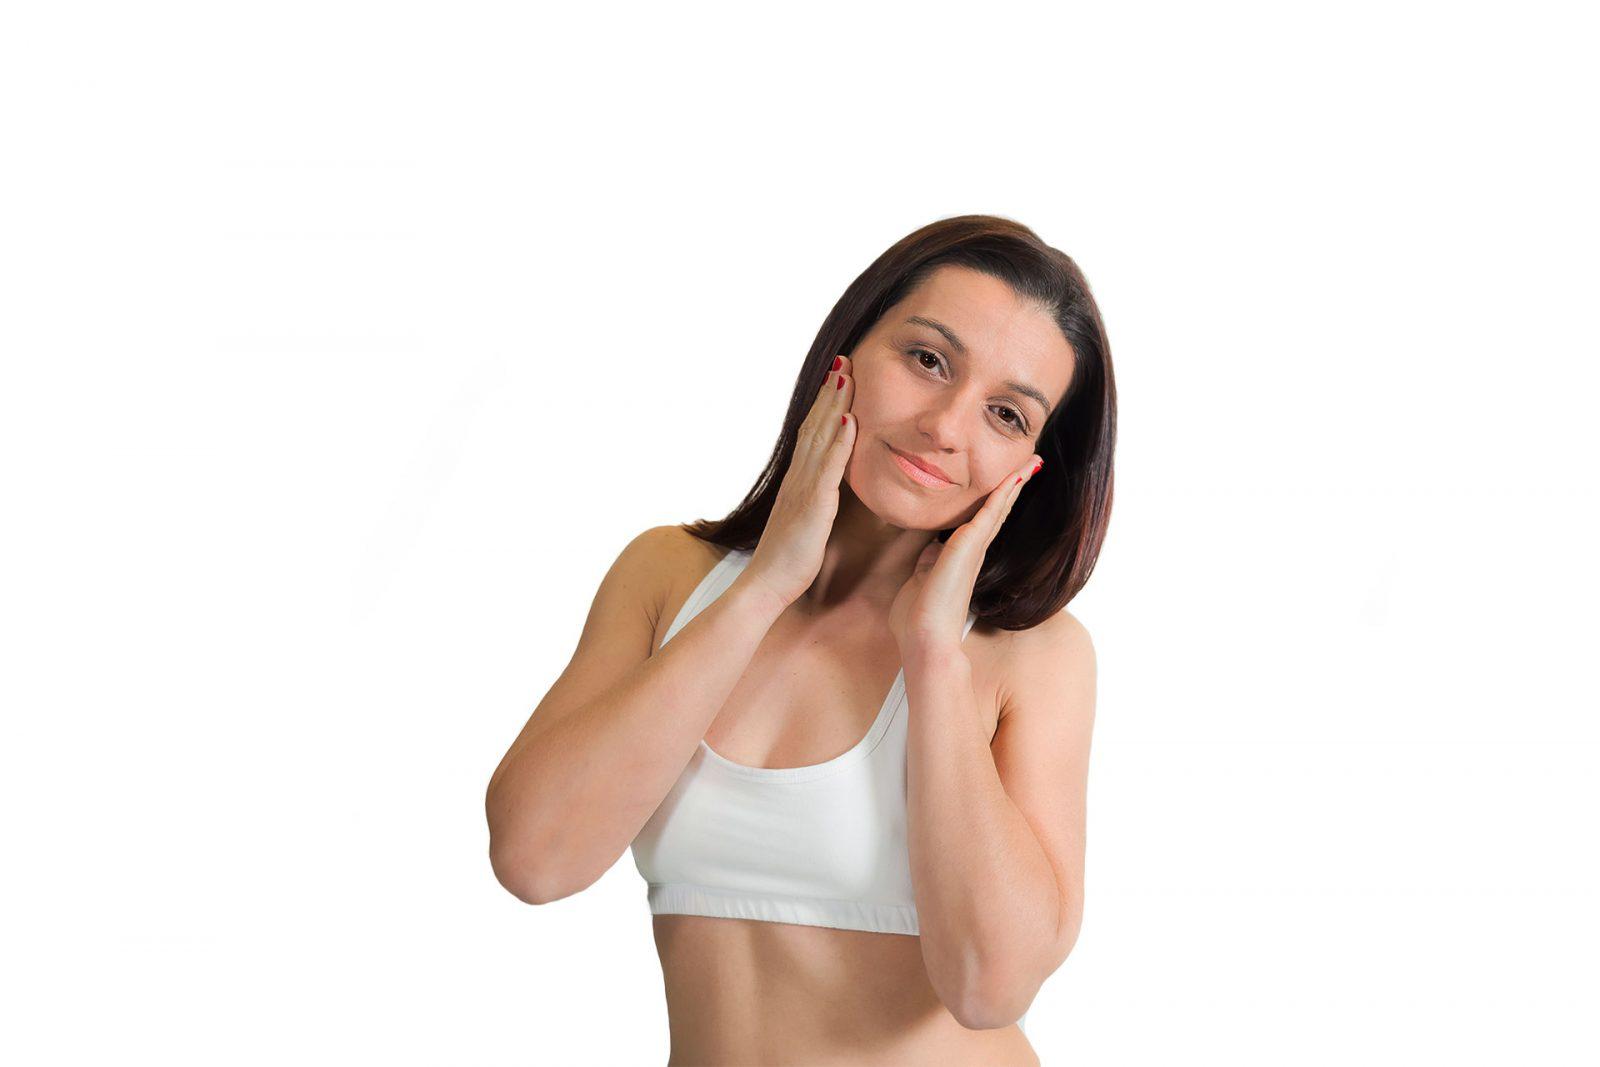 bodycience, clinicas, Manchas no Rosto